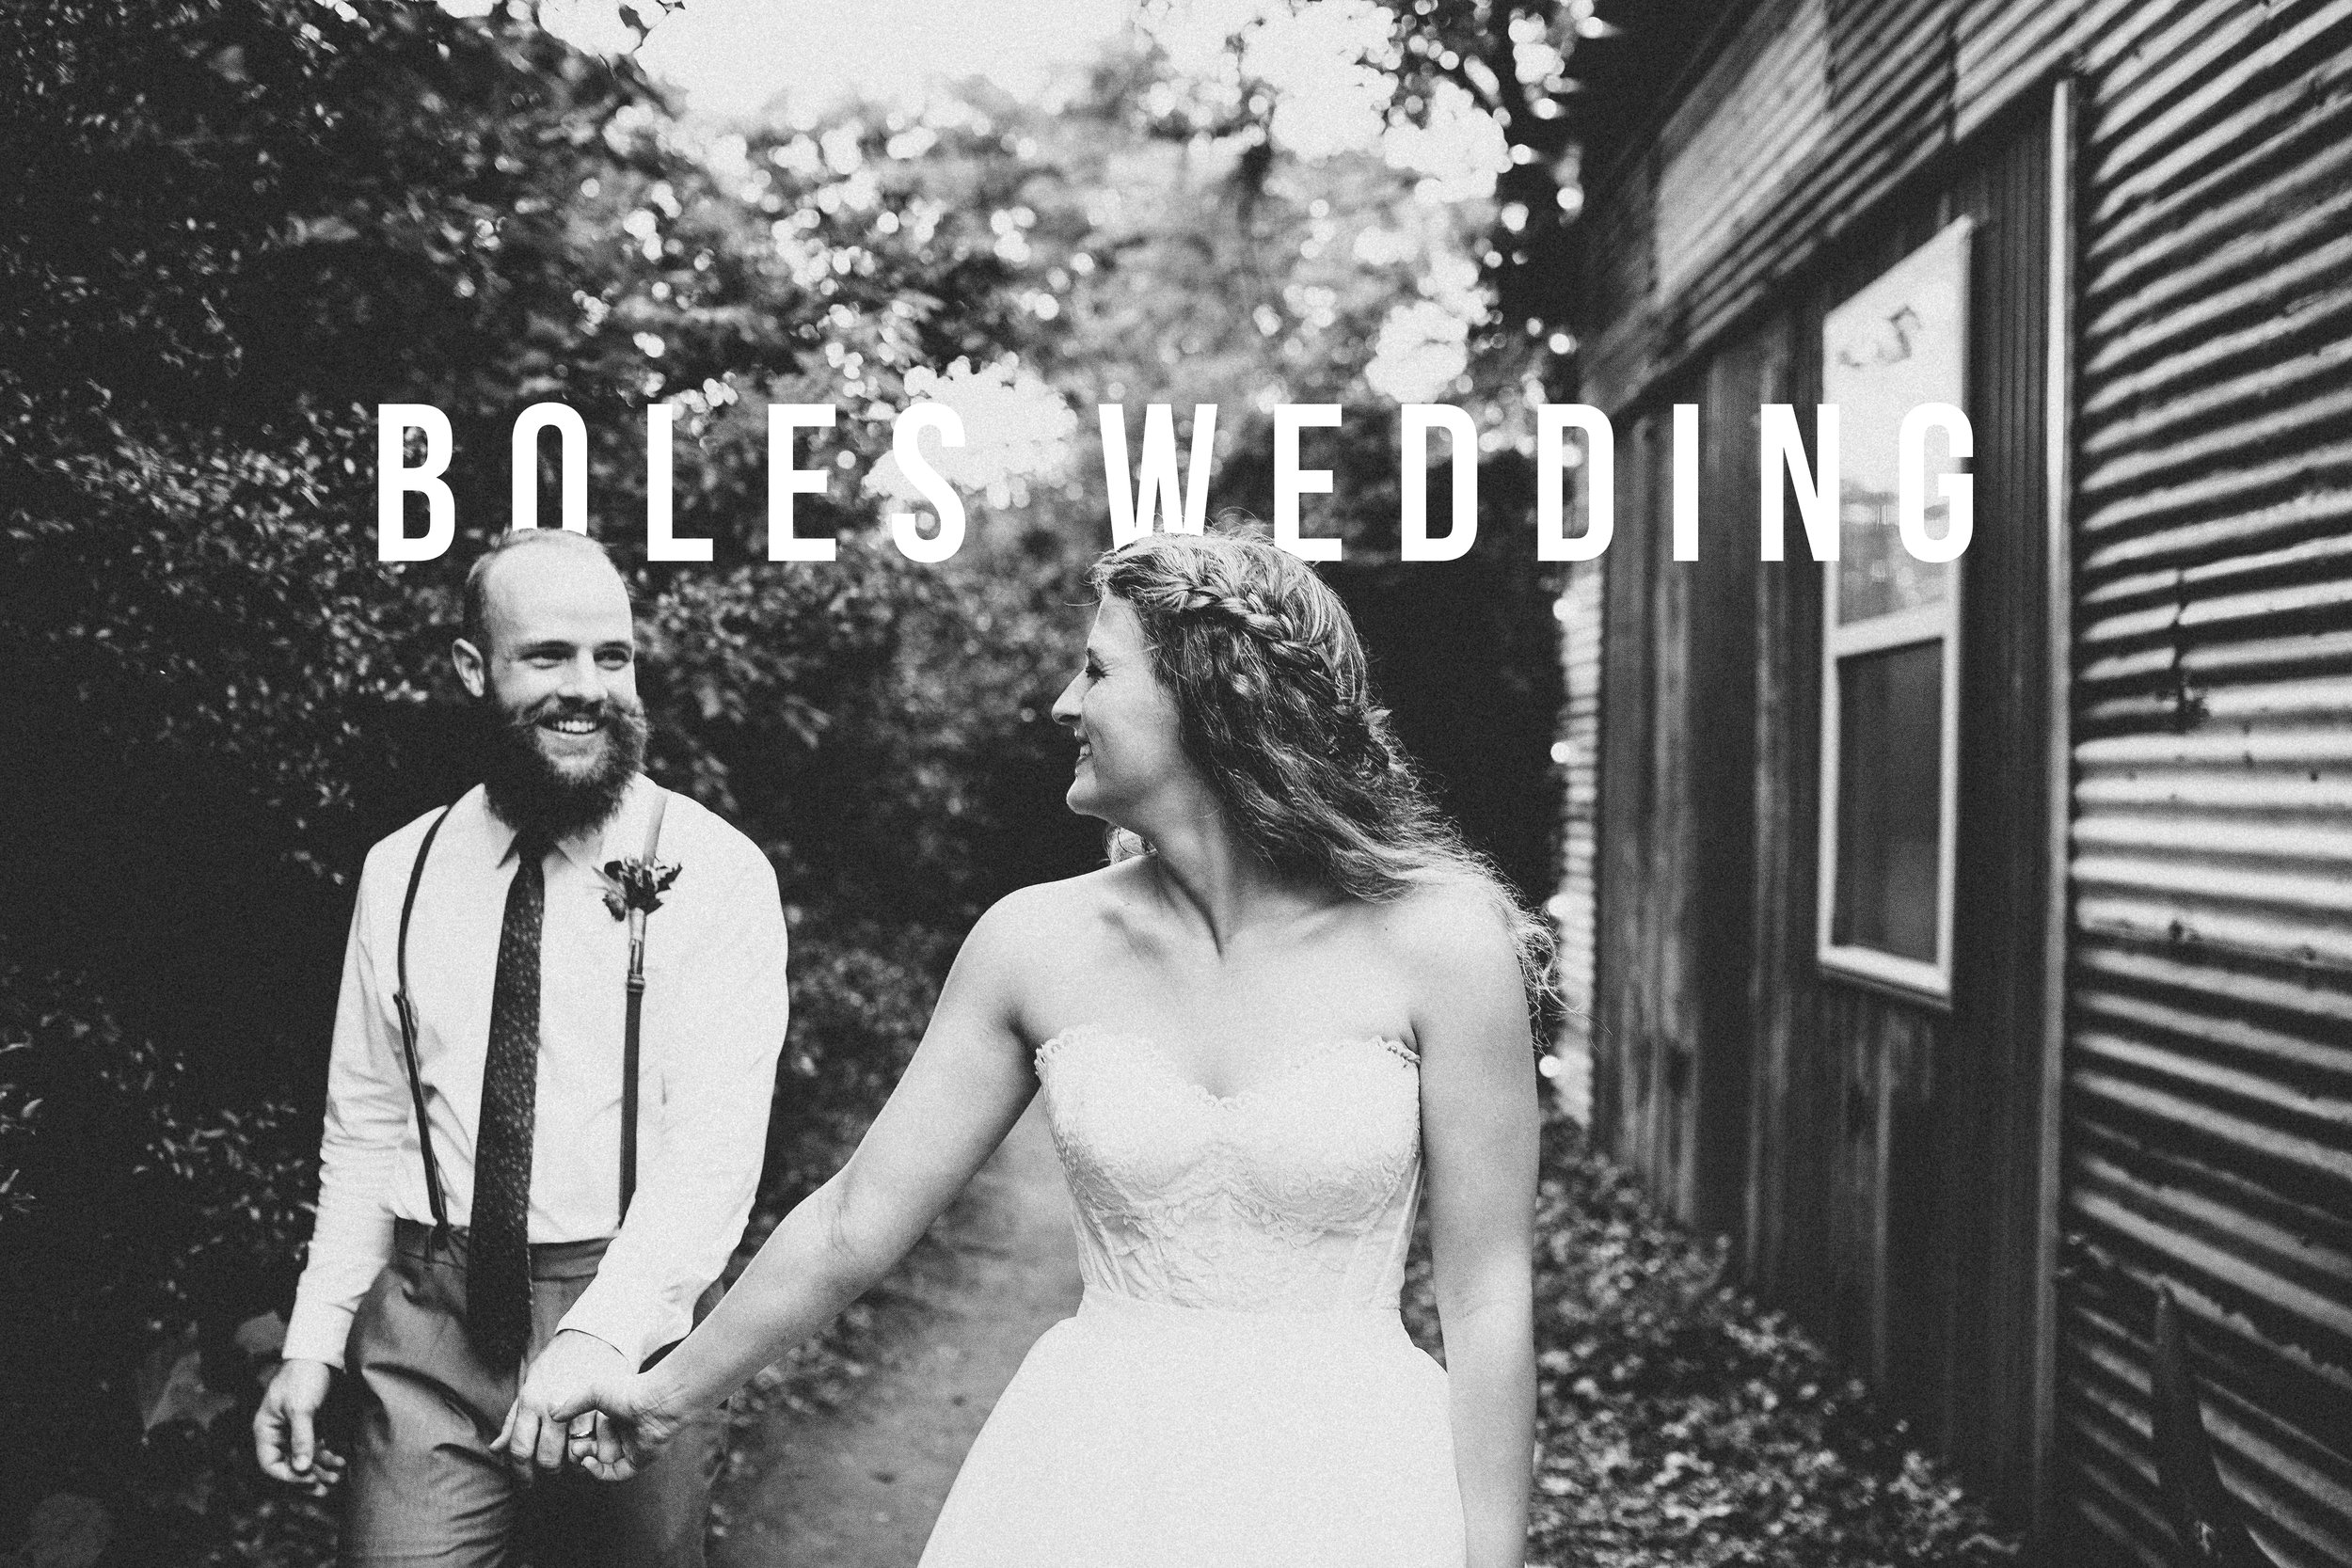 boles-wedding-ronin-cooking-stella-hotel-college-station-texas-wedding-new-york-city-wedding-photographer-stephanie-hanson-photo